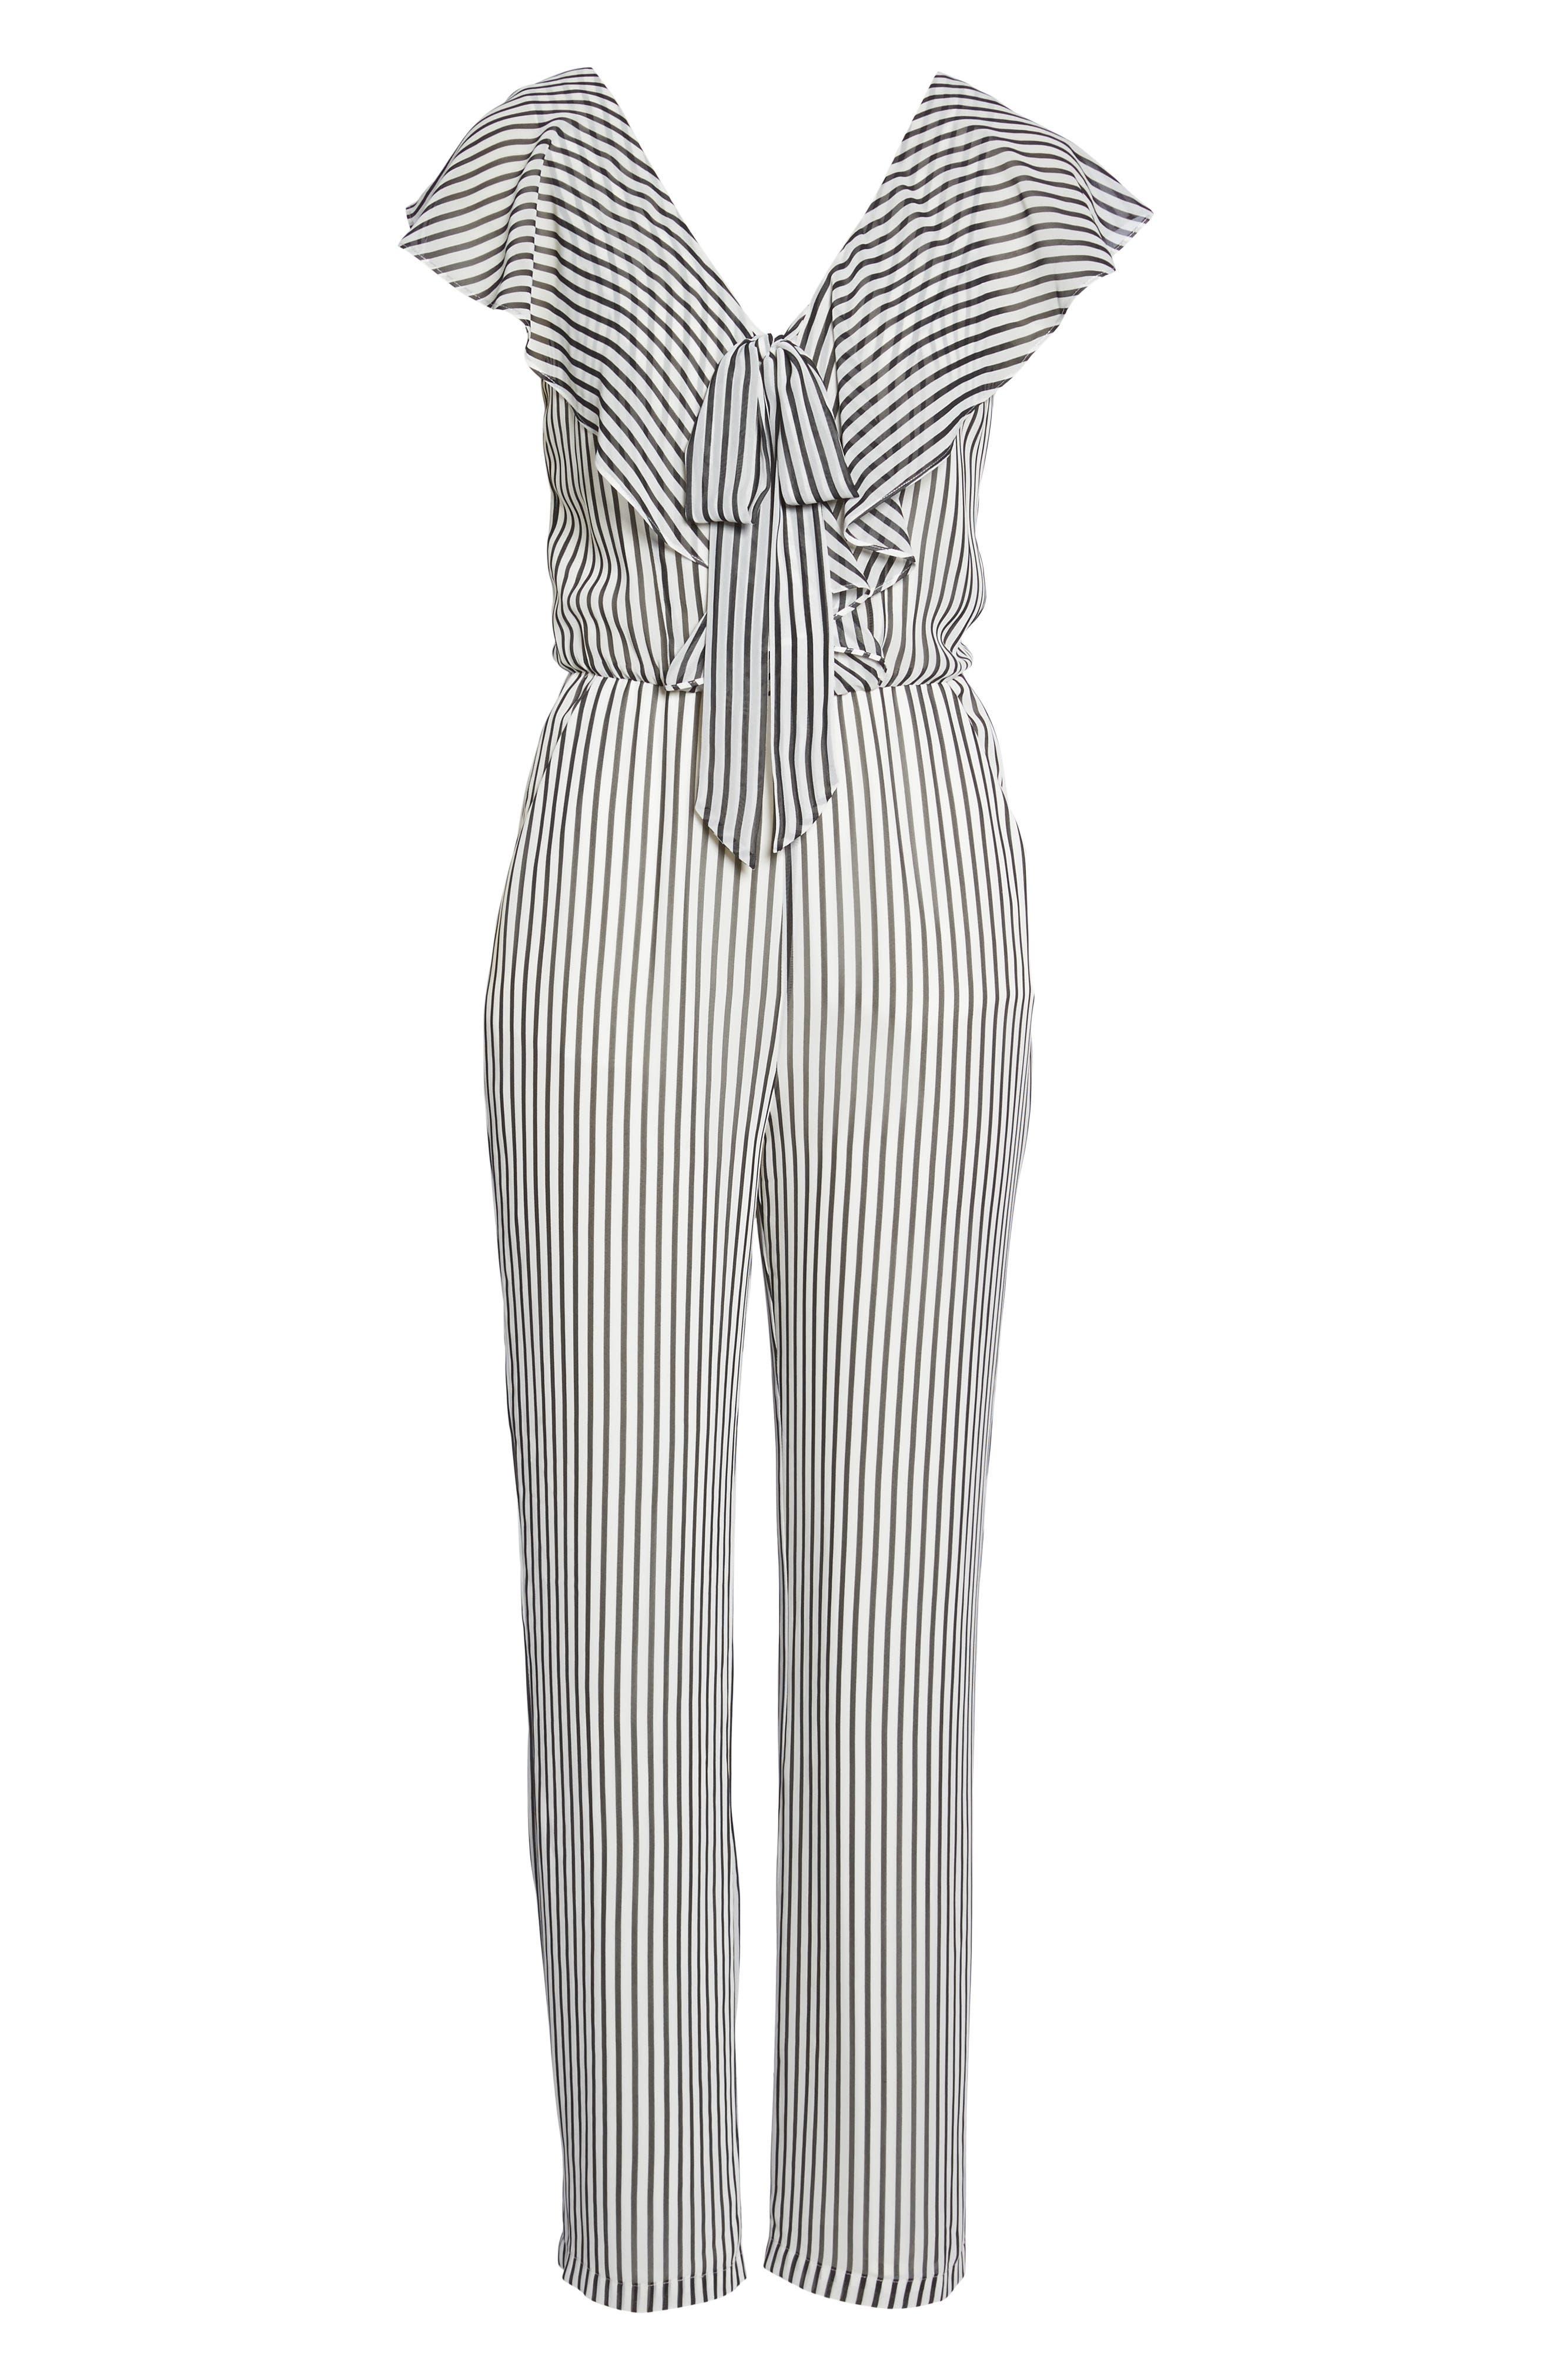 Cherry on Top Stripe Ruffle Jumpsuit,                             Alternate thumbnail 7, color,                             Black/ White Stripe